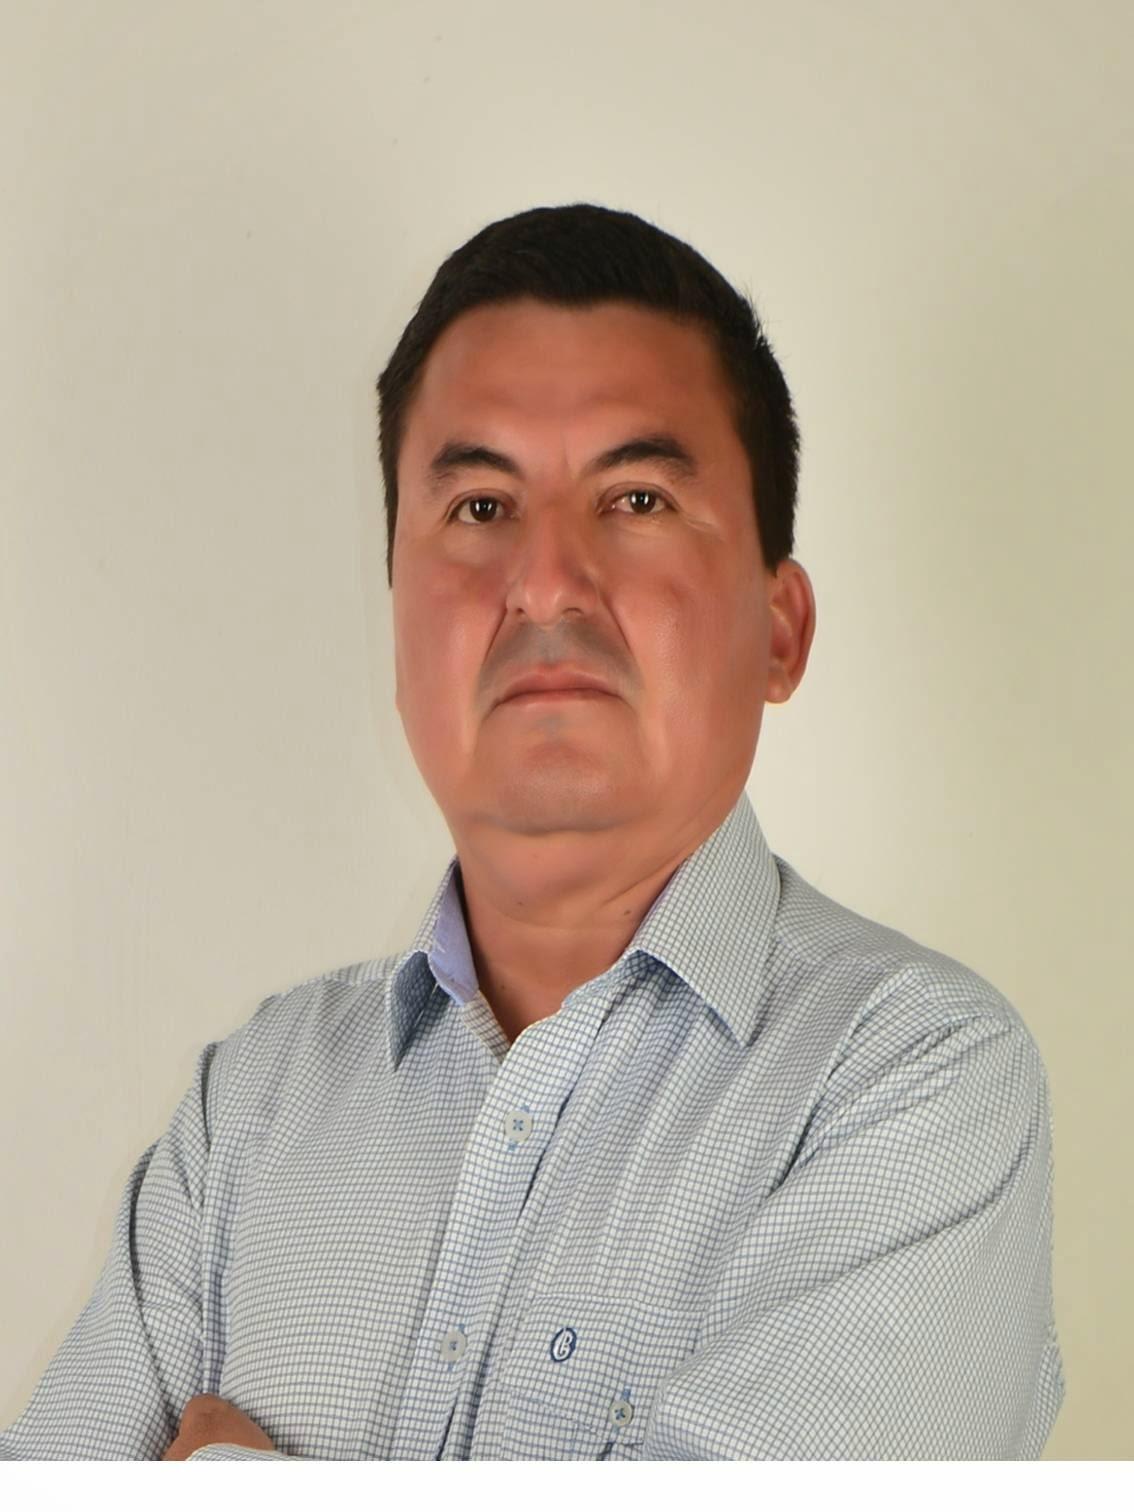 EDGAR URIEL USECHE TRIVIÑO